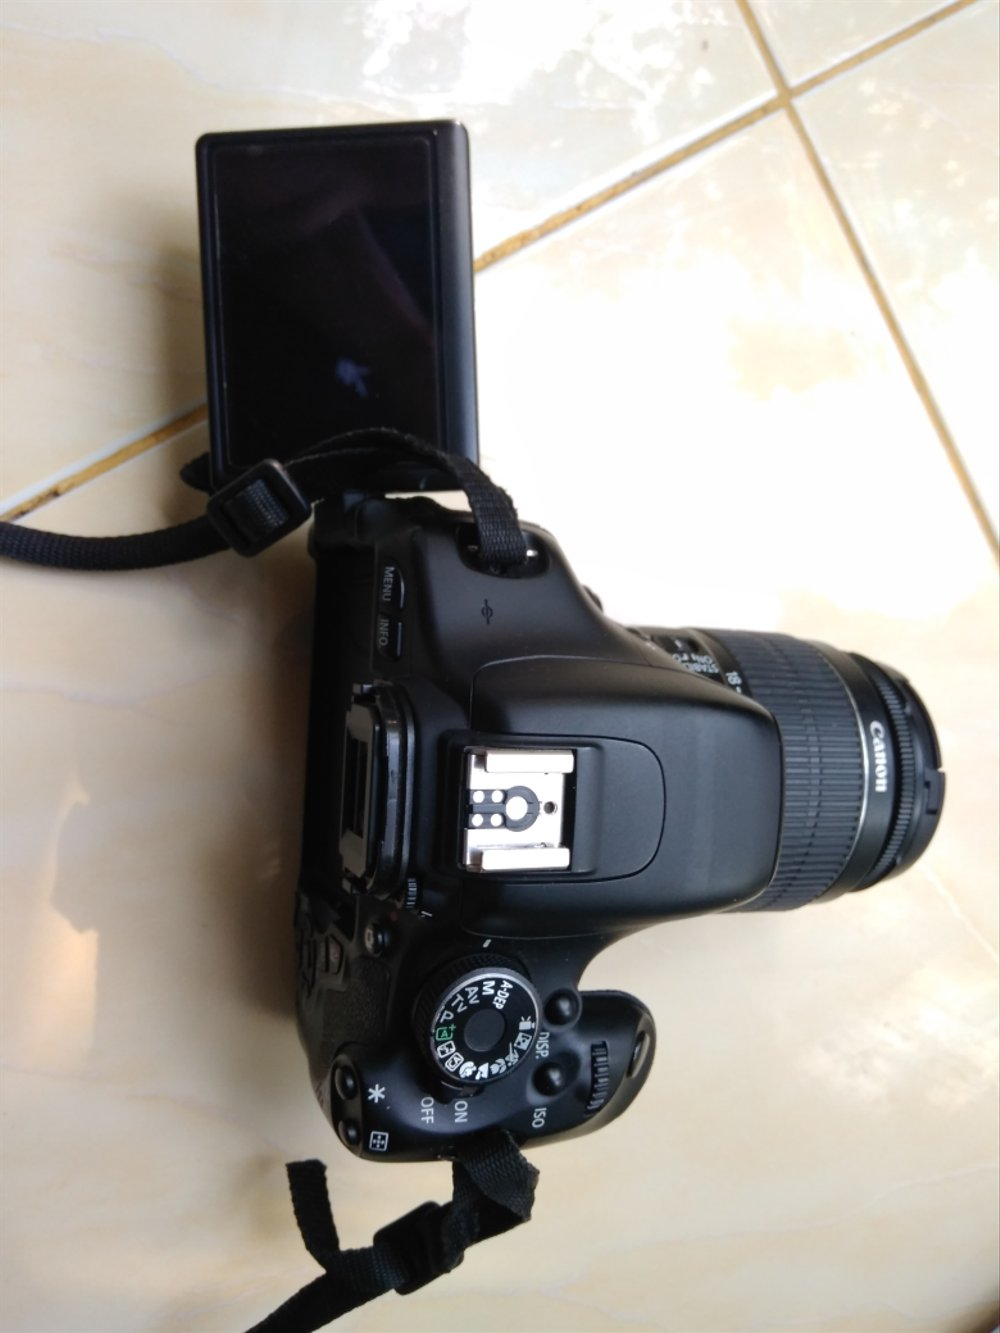 Efek Kamera Canon : kamera, canon, Download, Kamera, Canon, Formsgo